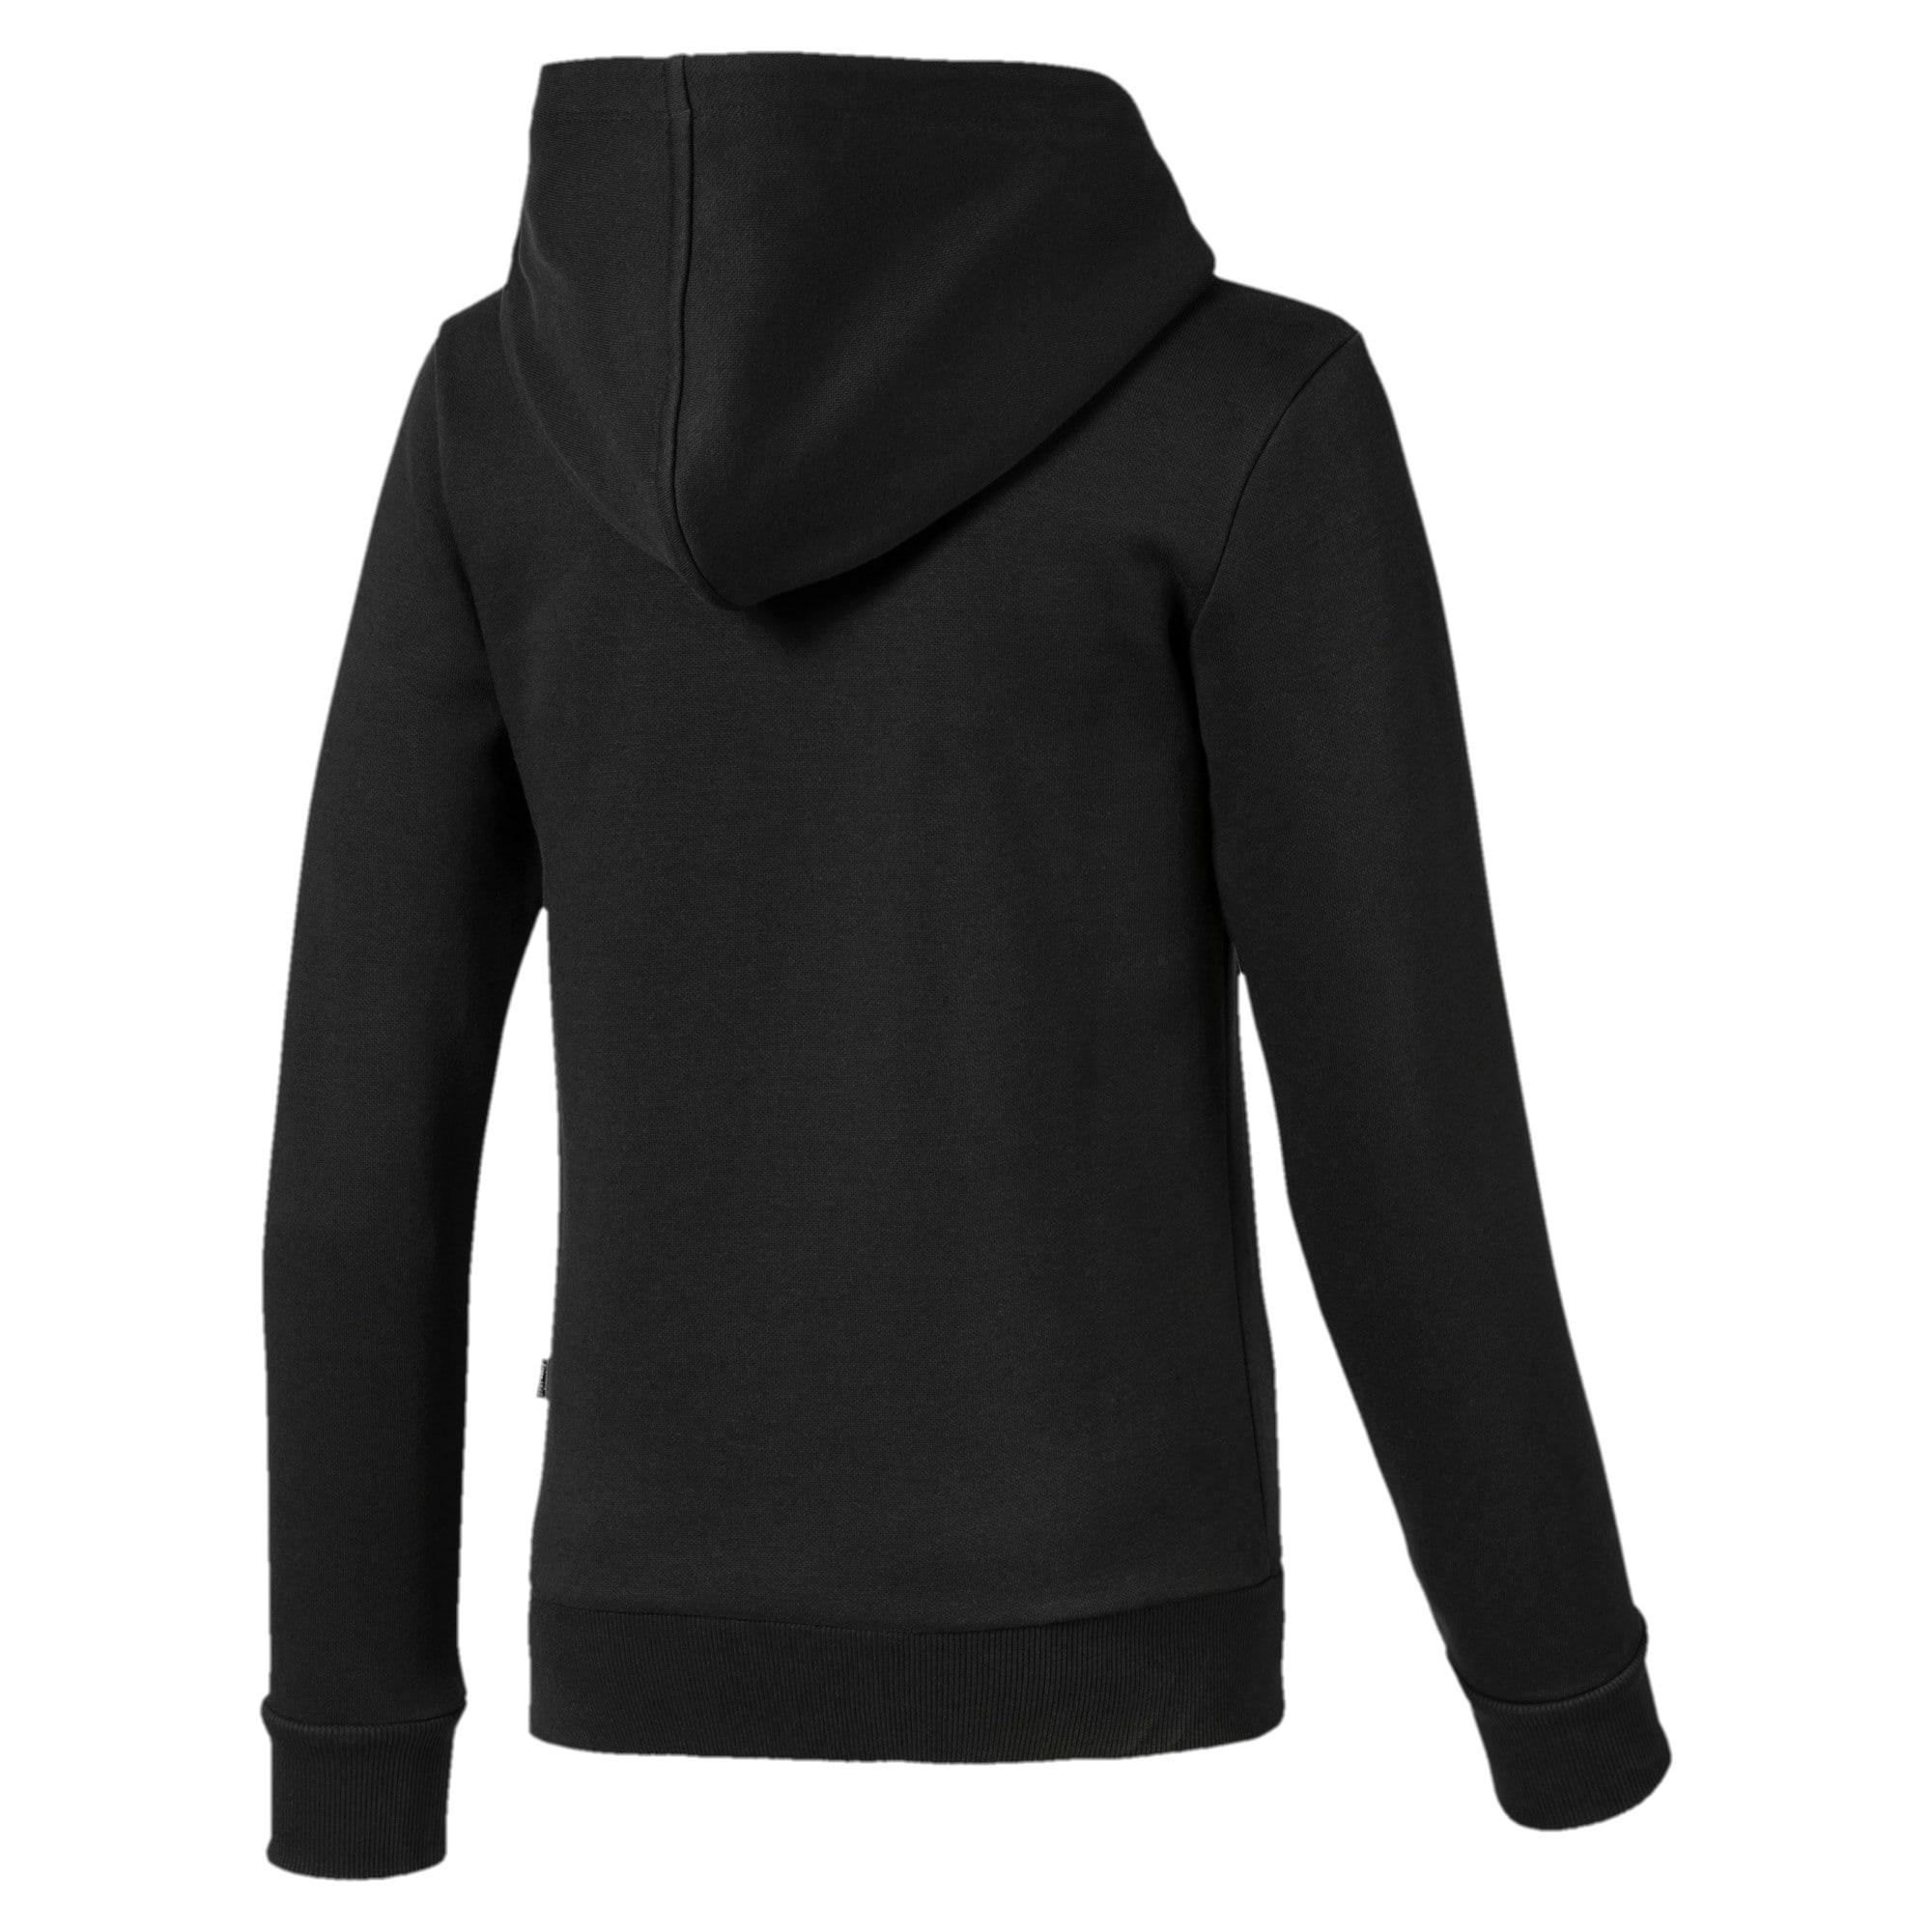 Thumbnail 2 of Full Zip Girls' Jacket, Puma Black, medium-IND